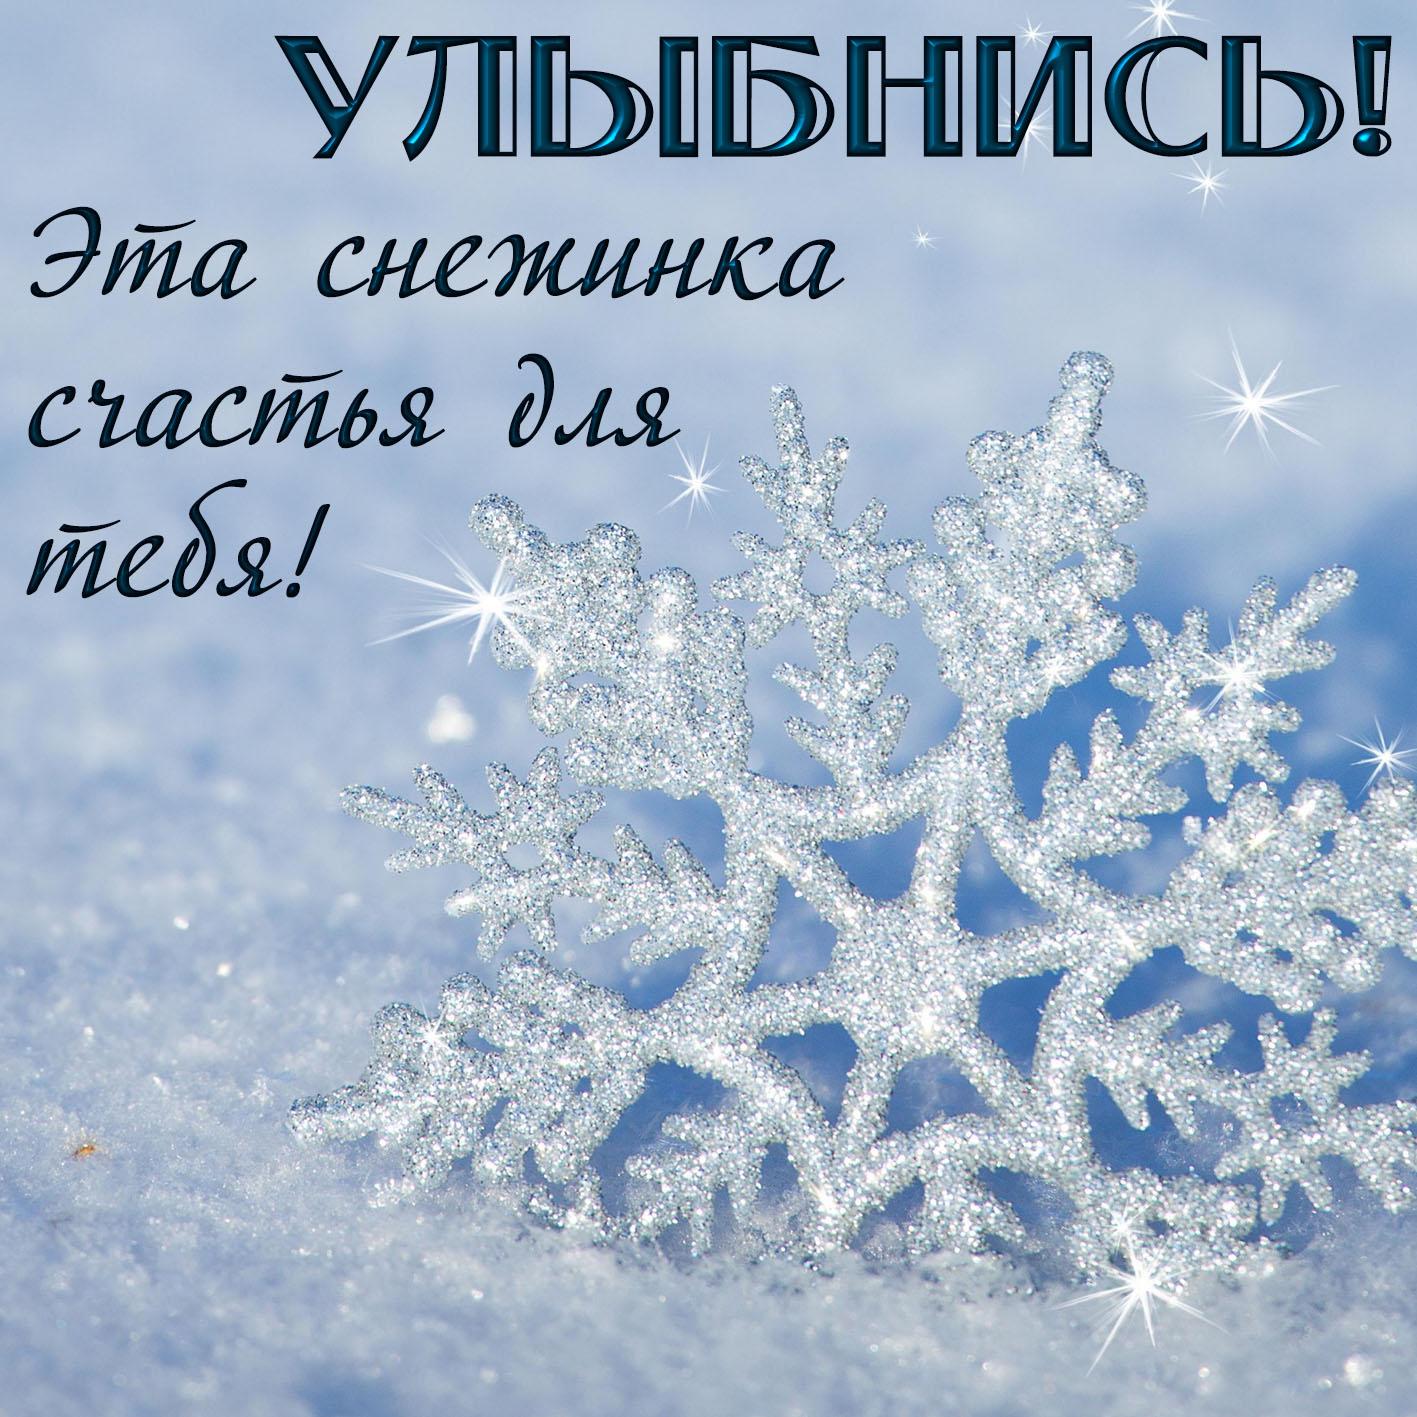 между картинка снежинки радости дуть воздух сервисе